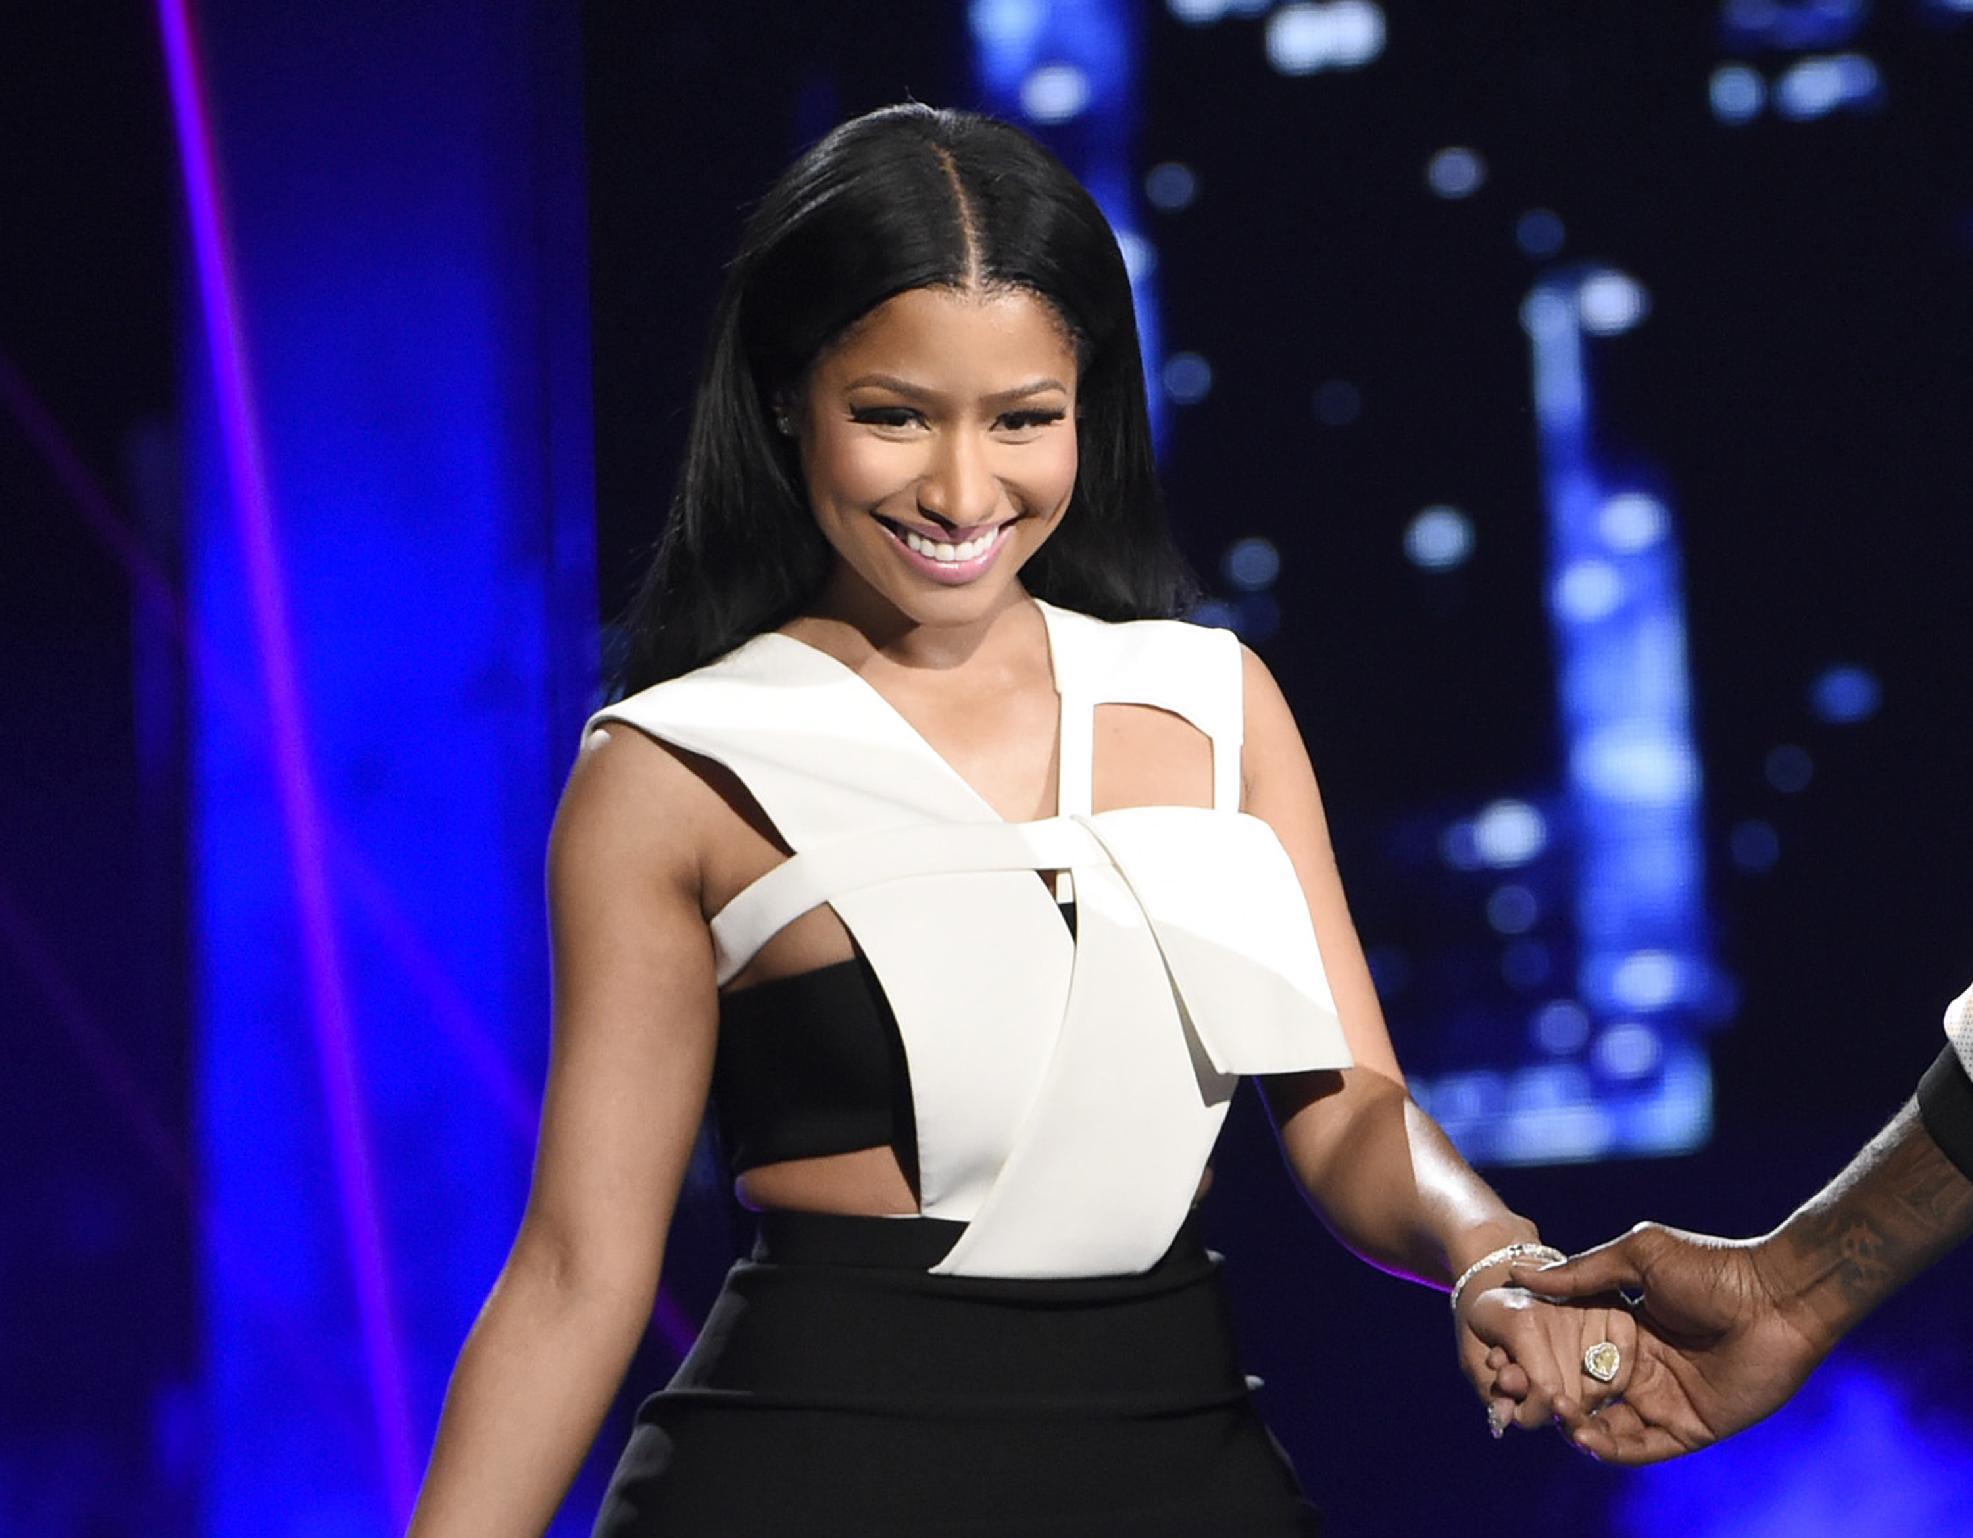 Swift apologizes to Minaj about tweet over VMA nominations